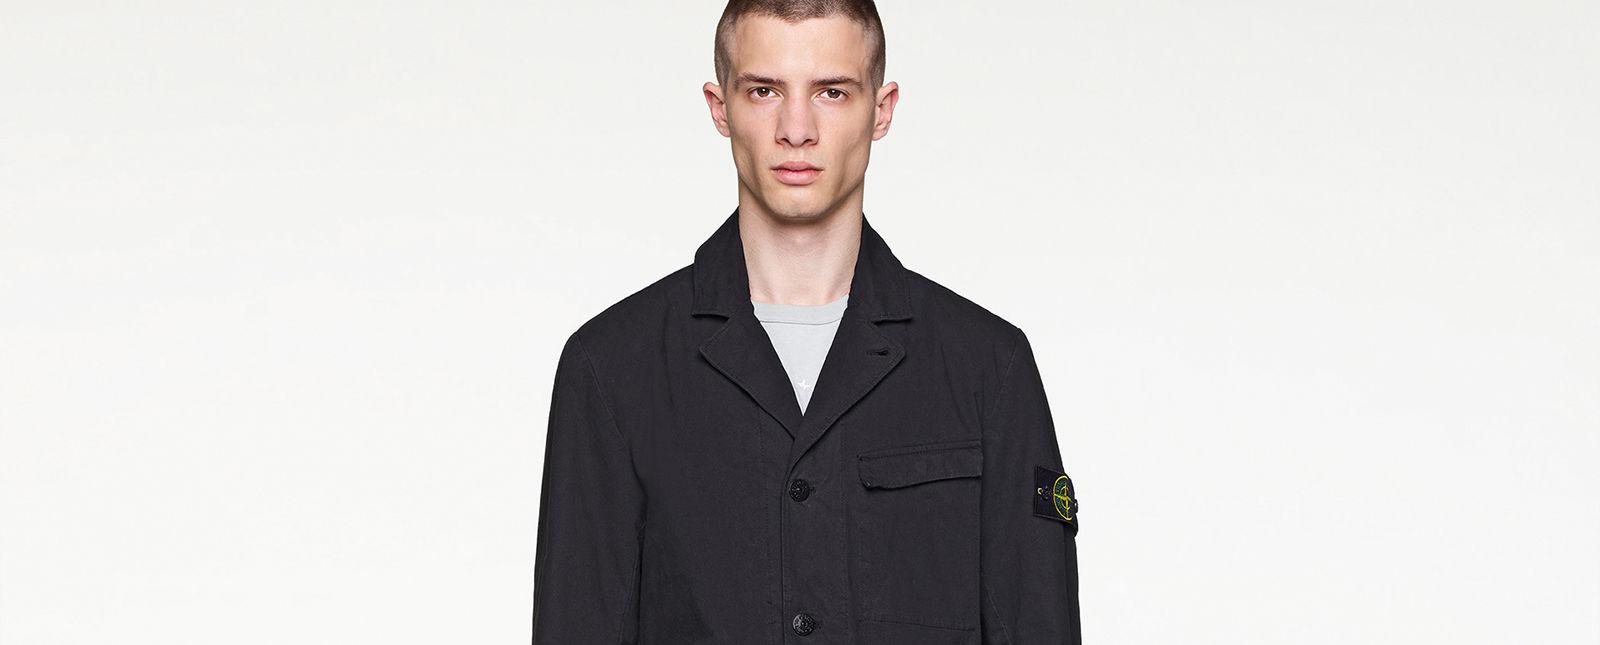 Model wearing black, single breasted jacket with Stone Island badge on left arm.